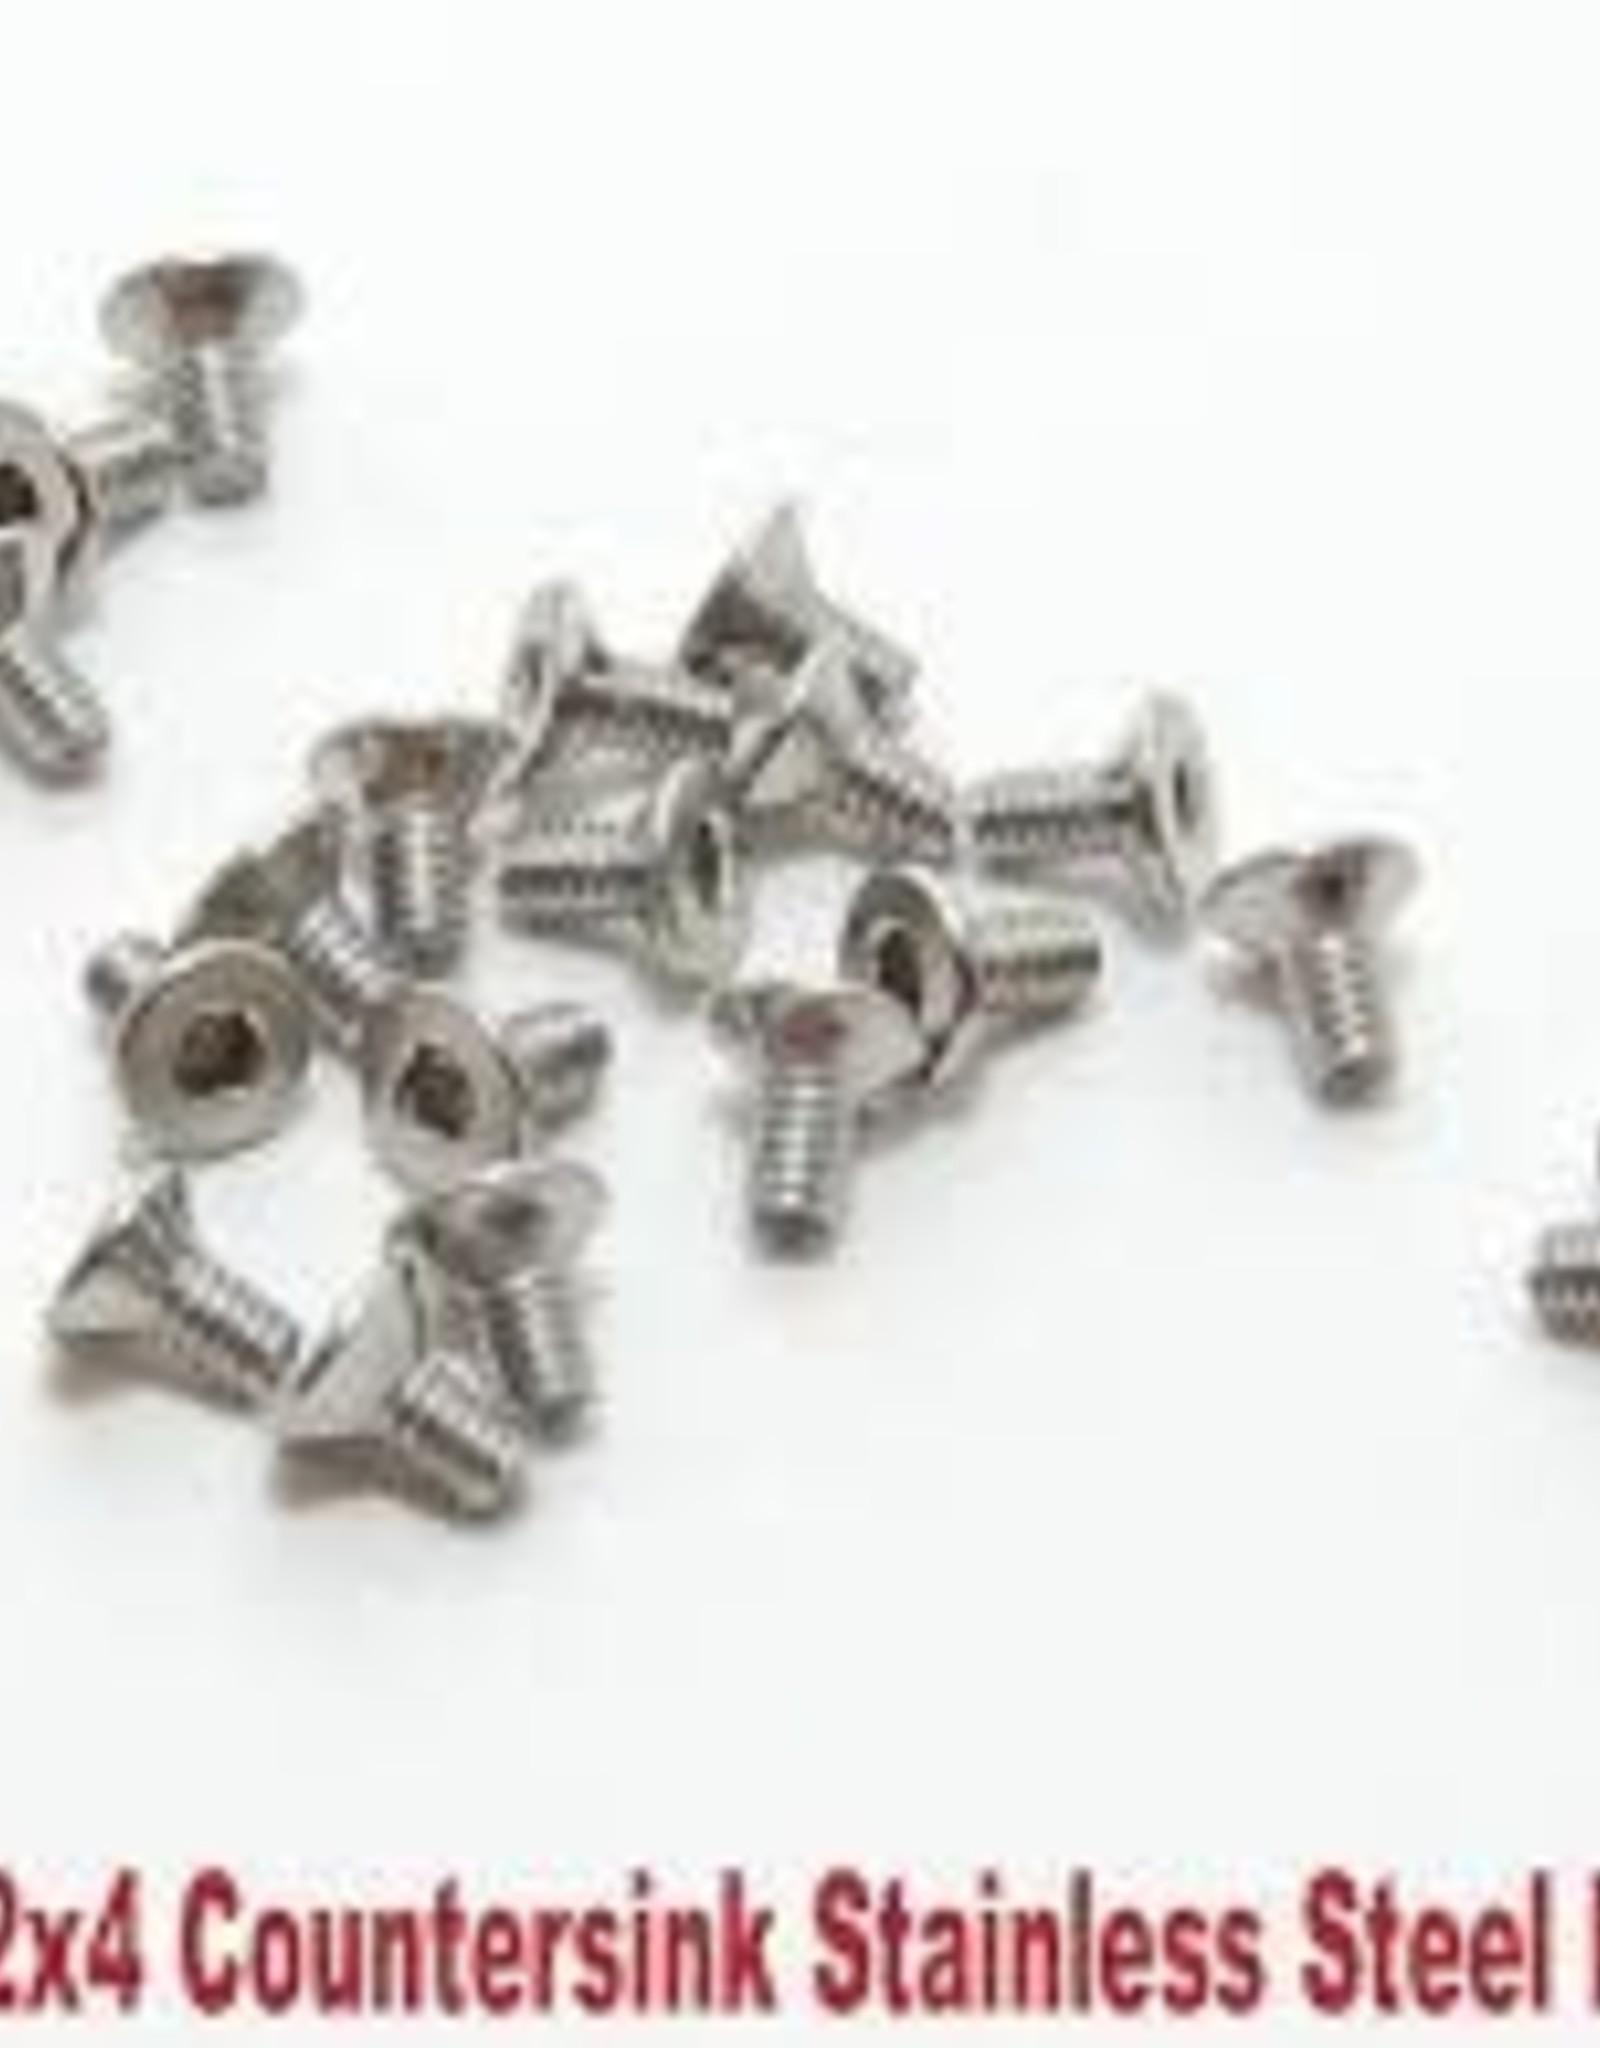 PN Racing PN Racing M2x4 Countersink Stainless Steel Hex Machine Screw (20pcs)